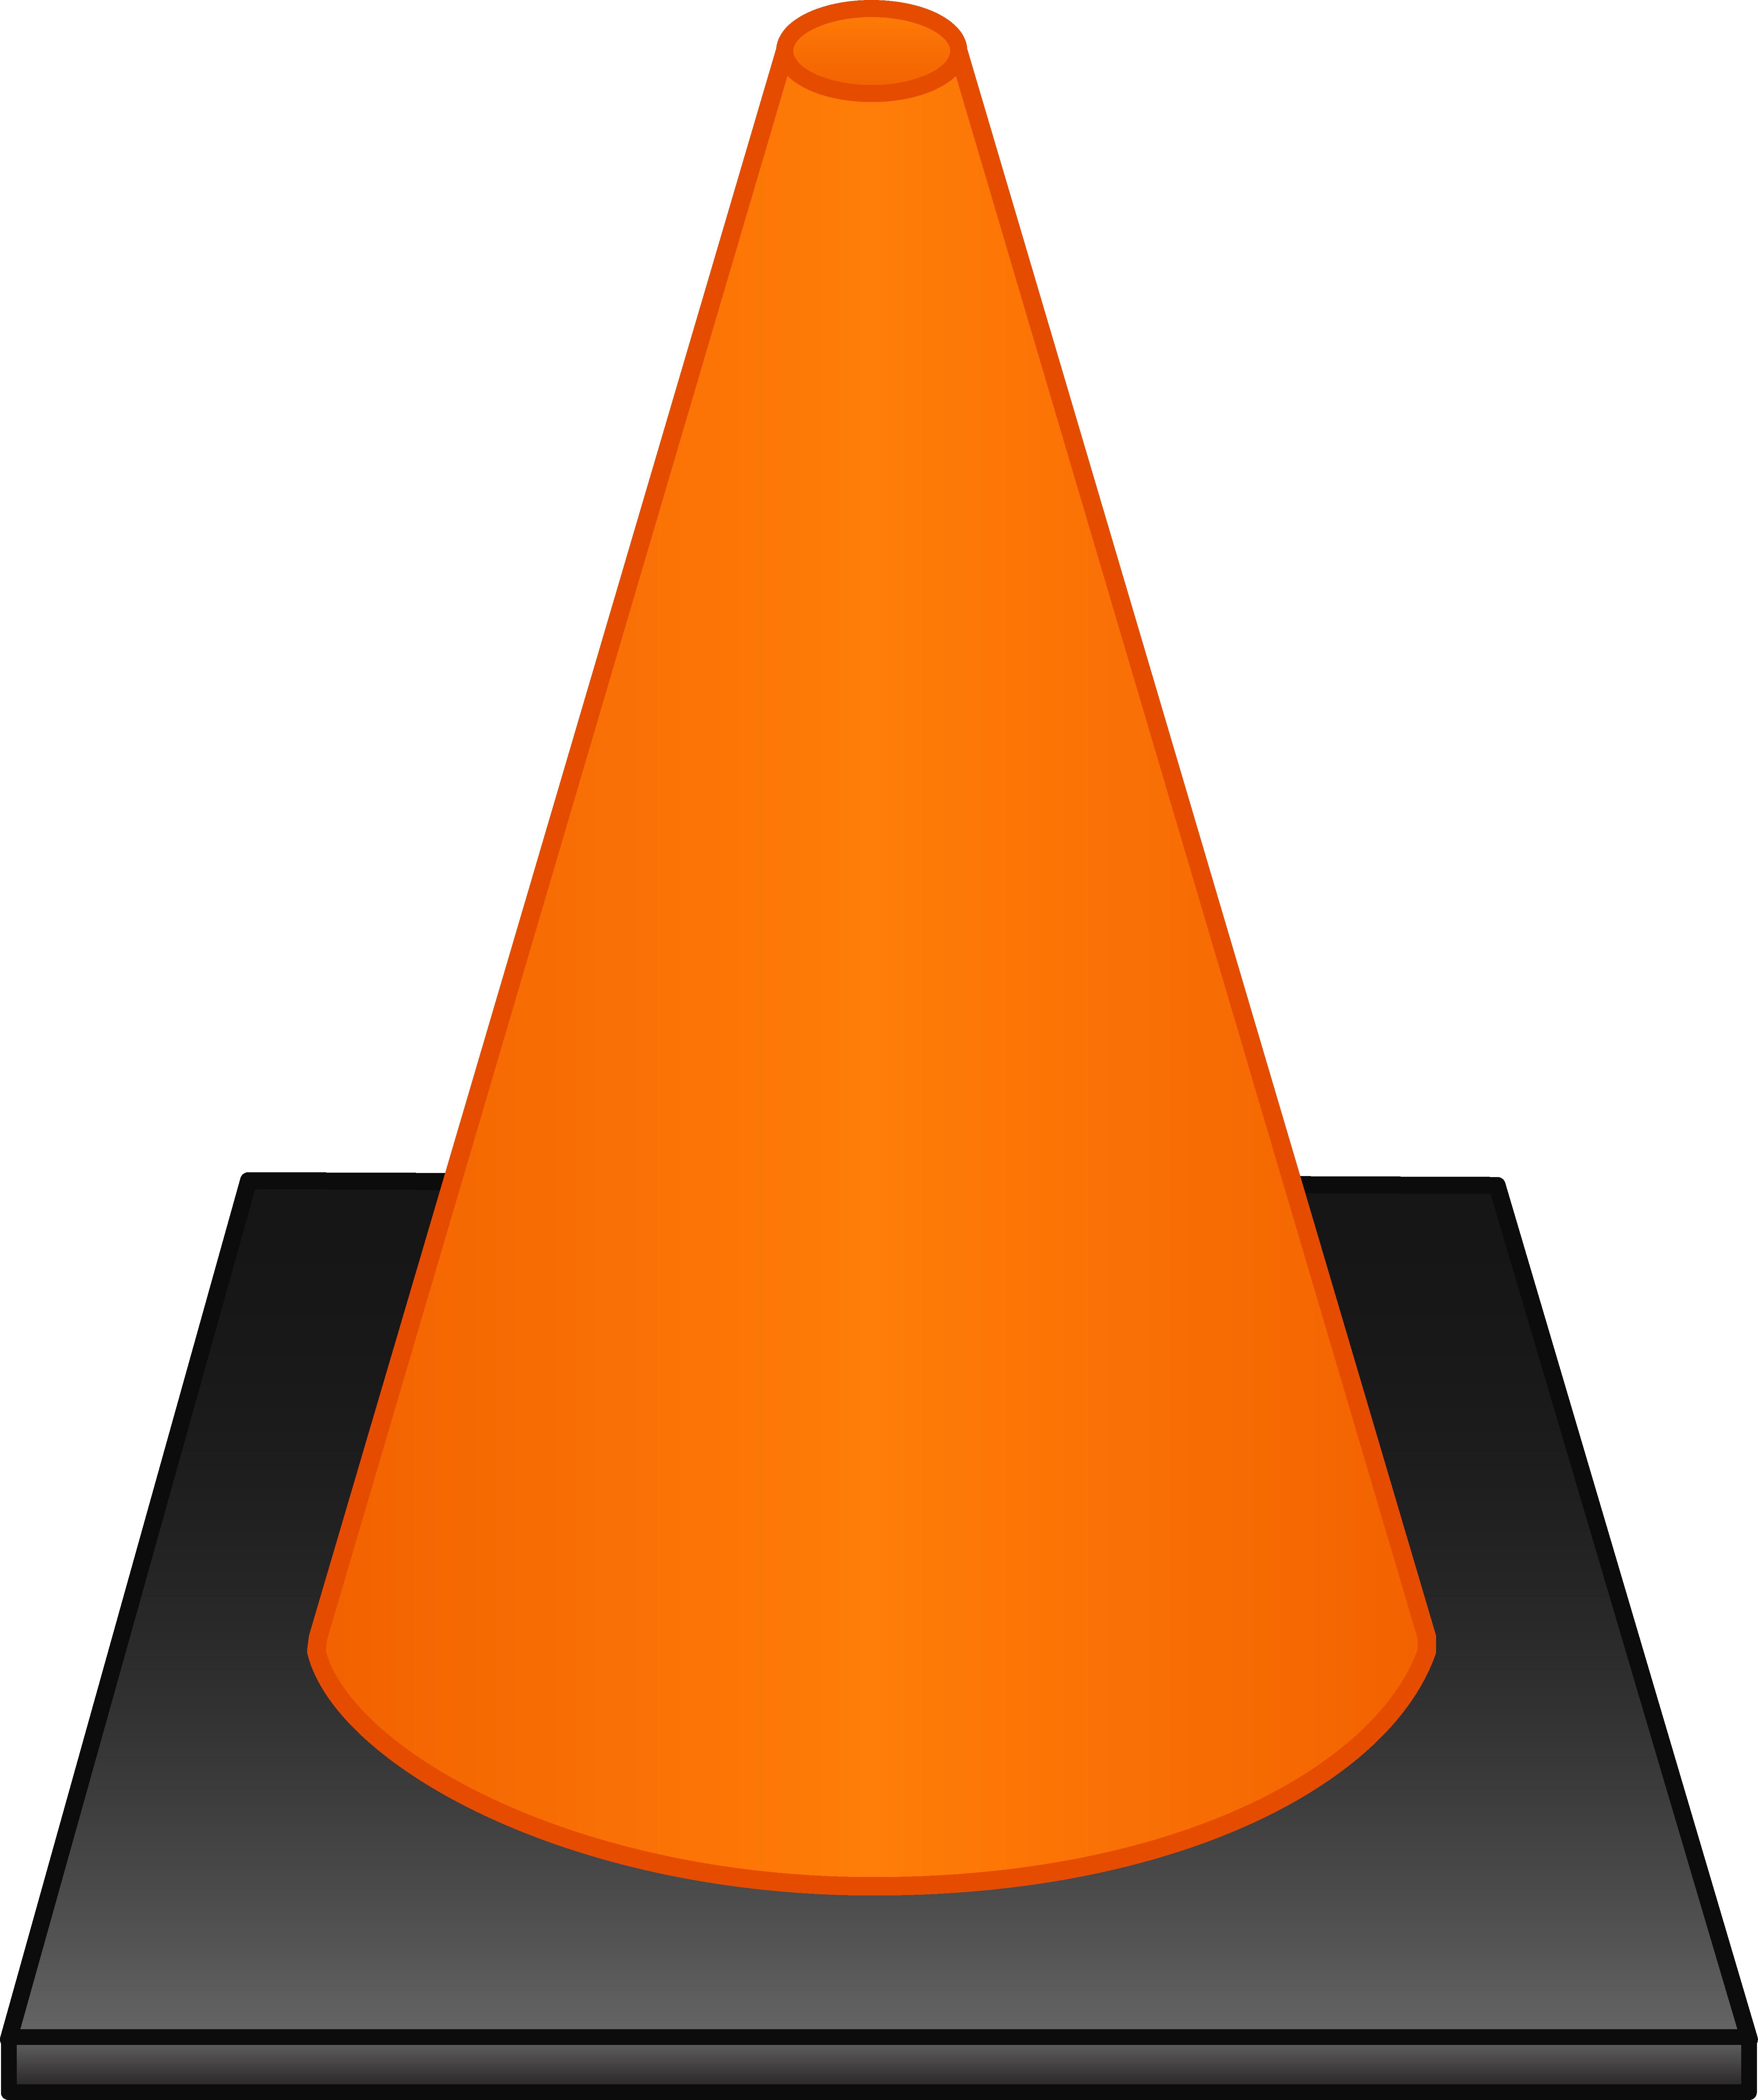 Pathway clipart psalm 121. Orange traffic cone free